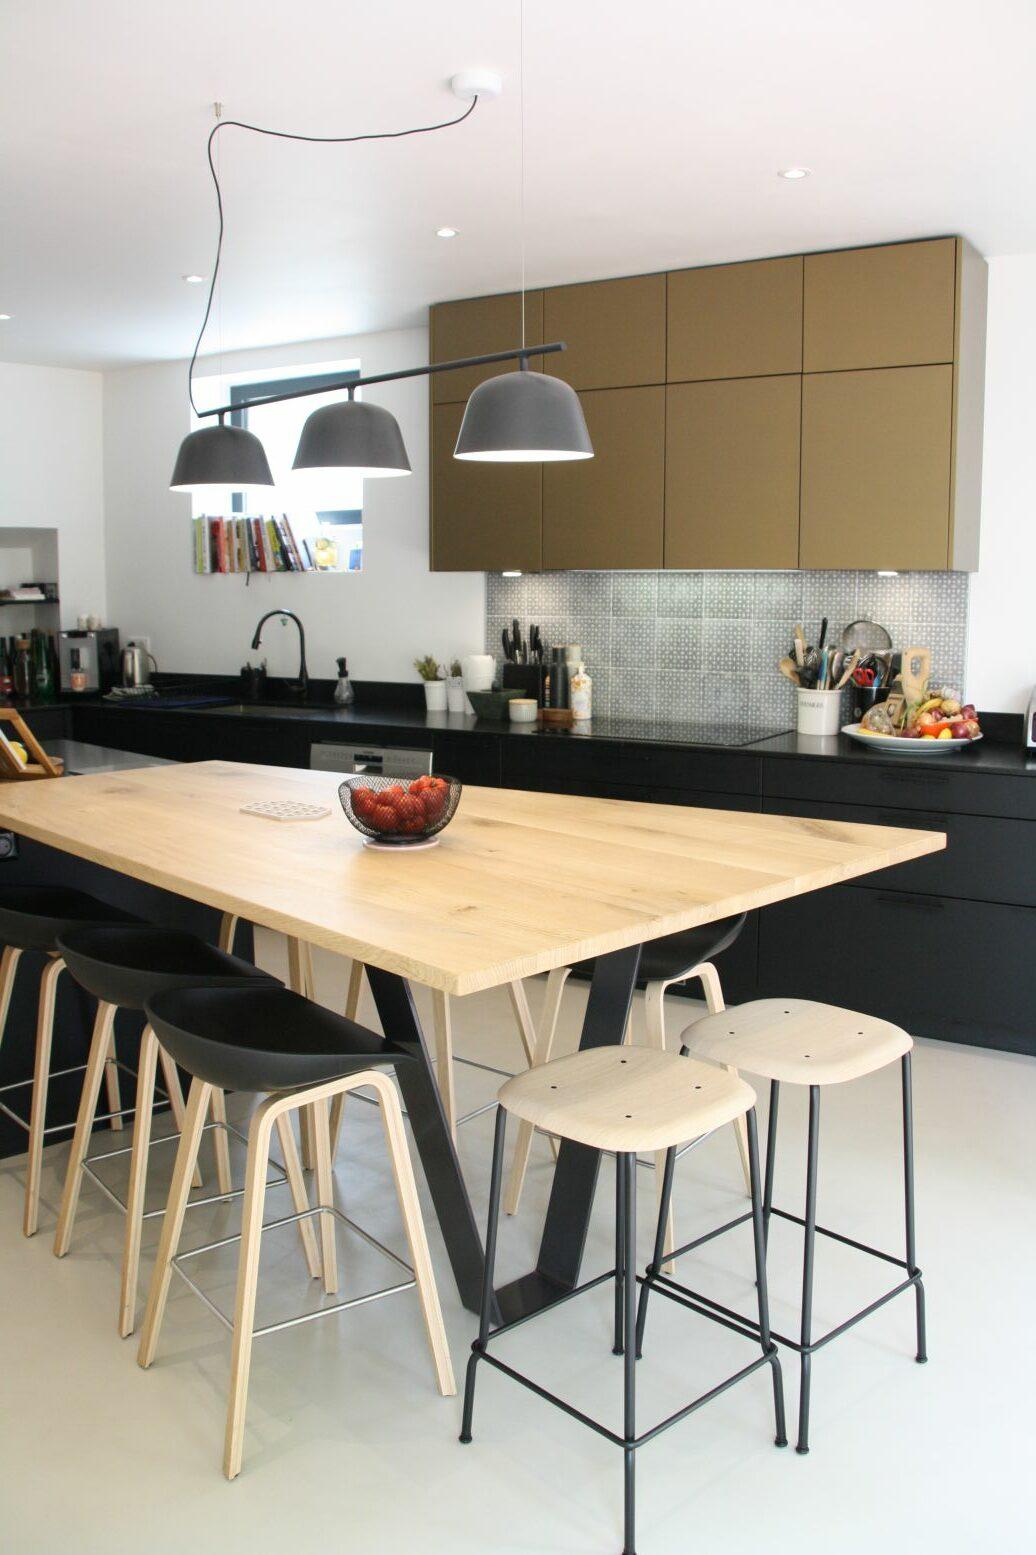 cuisine - noir - or - bronze - luminaire - table - bois - tabouret